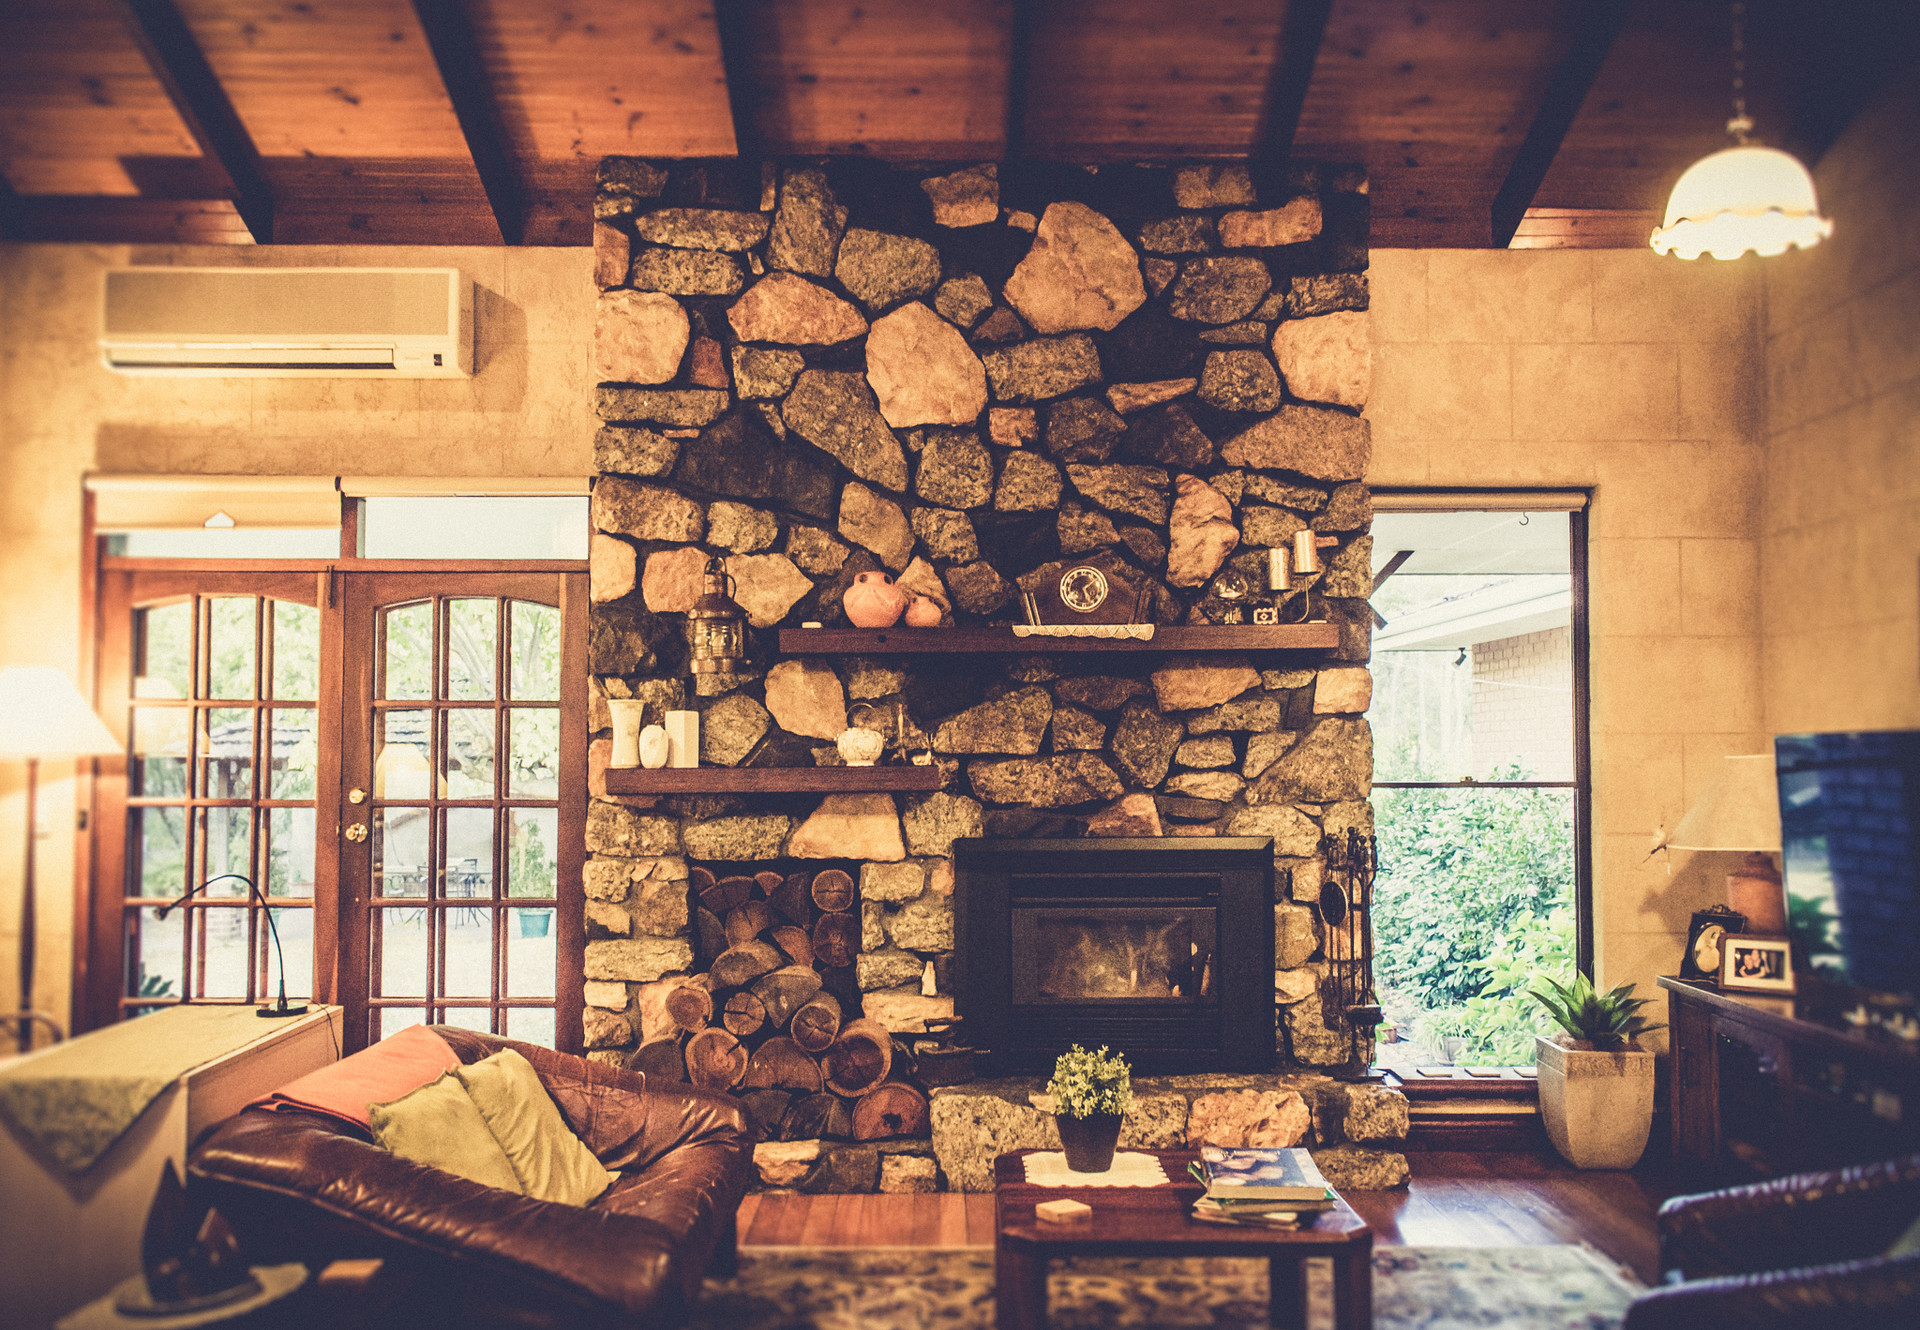 Mandia's fireplace